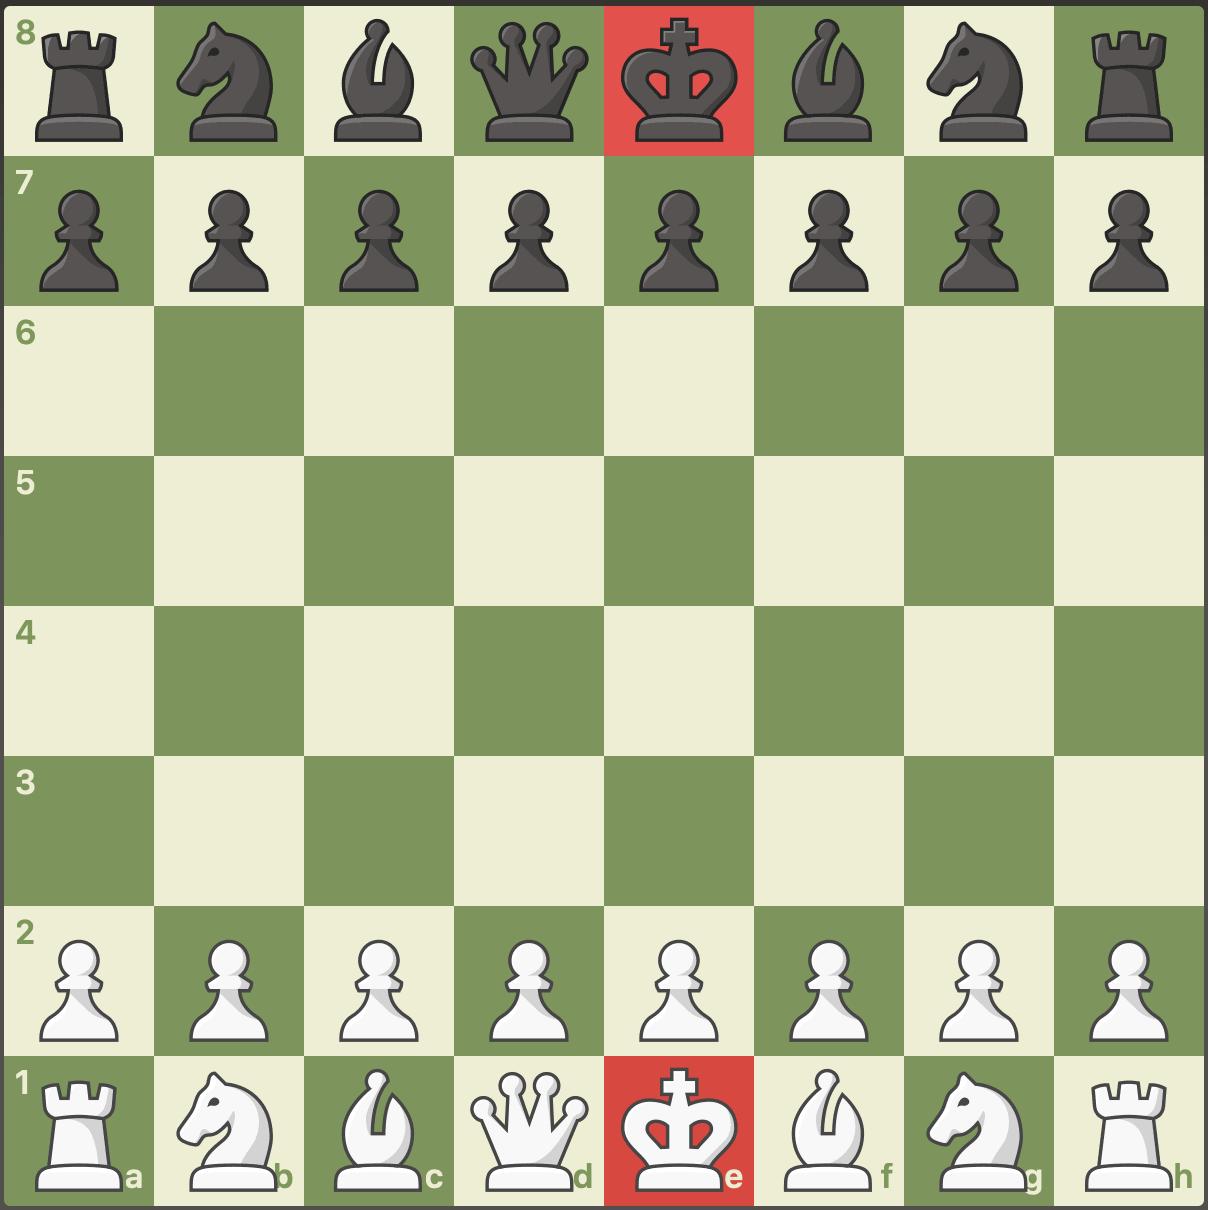 king starting position